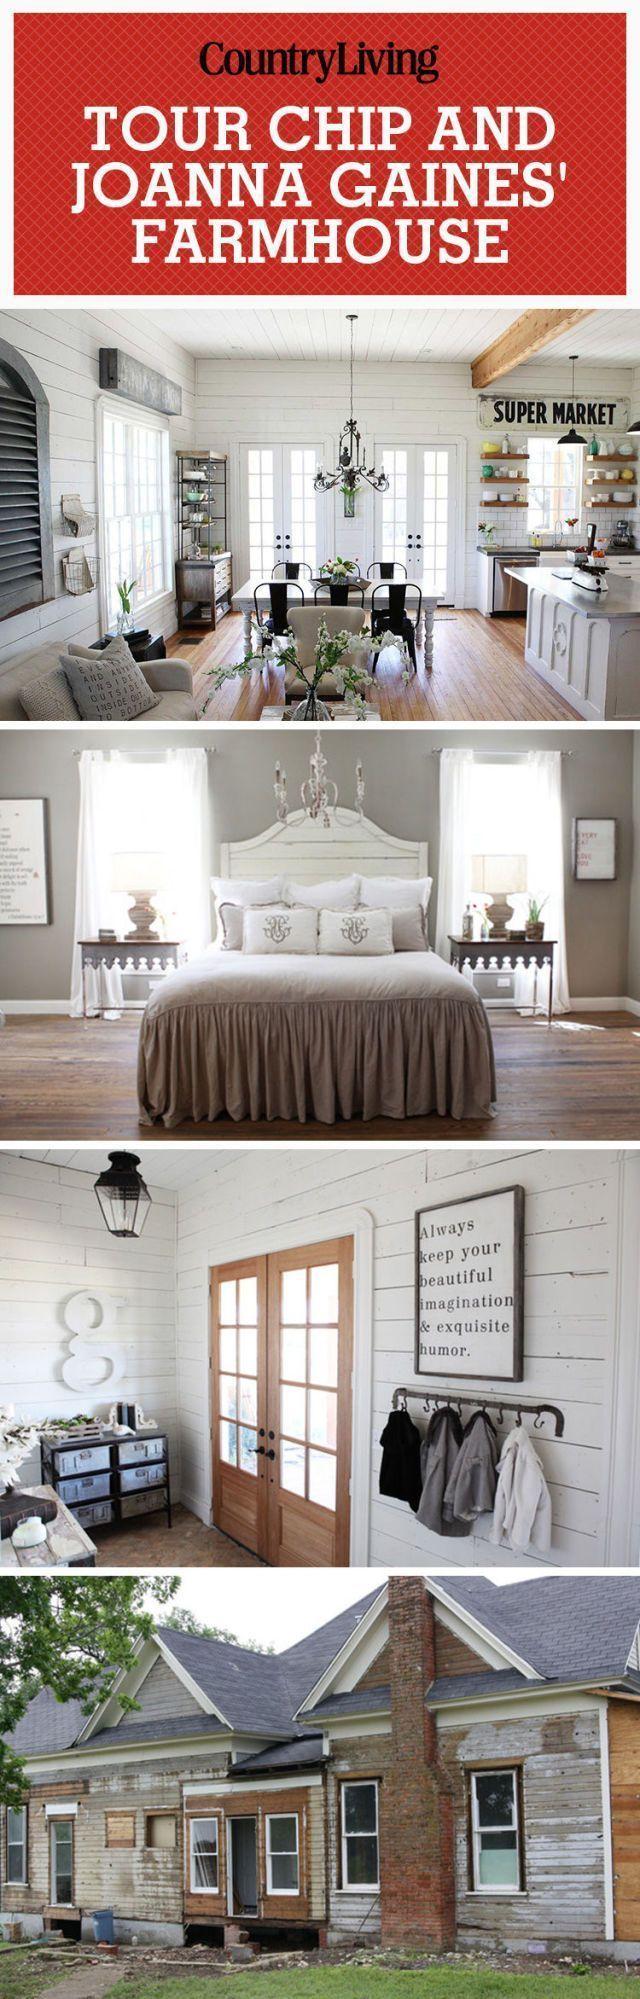 best bunkhouse ideas images on pinterest decks arquitetura and